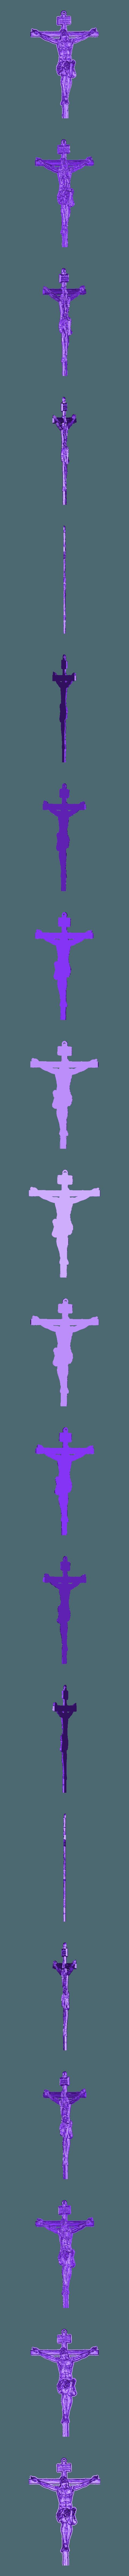 jesus_LITHOPHANE.stl Download free STL file Litophany Jesus Christ • Object to 3D print, 3dlito